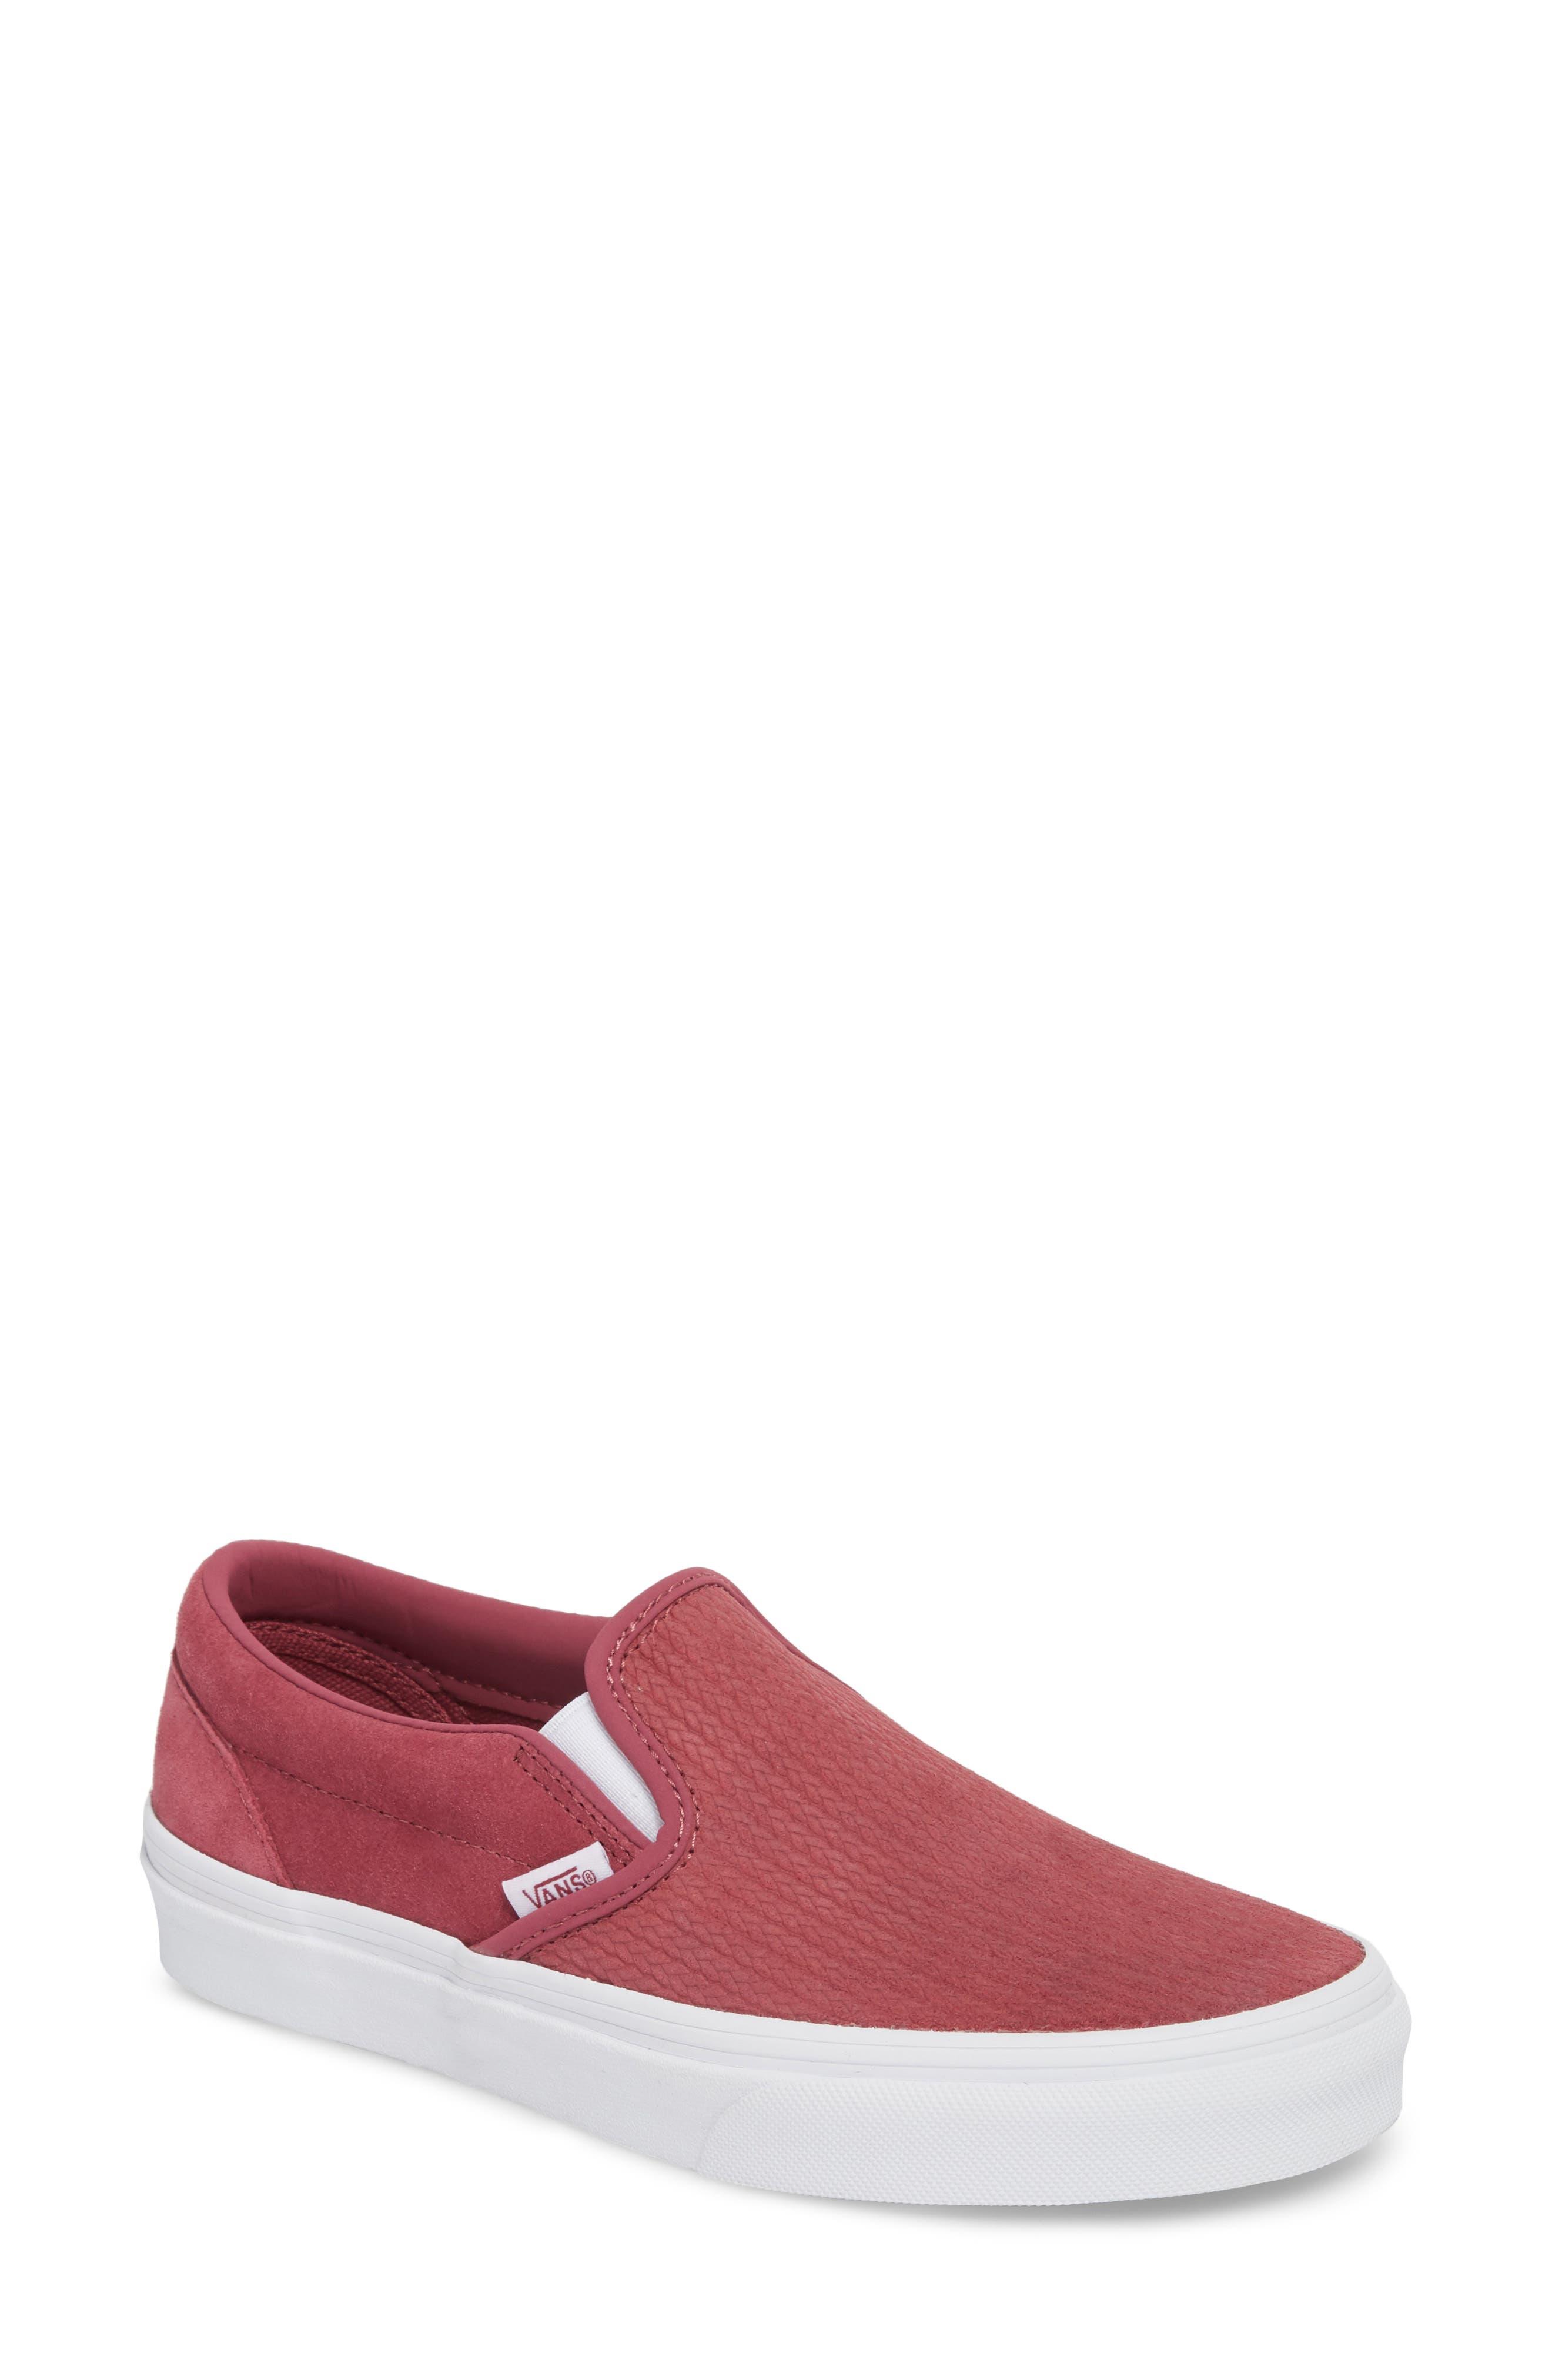 ,                             Classic Slip-On Sneaker,                             Main thumbnail 213, color,                             665